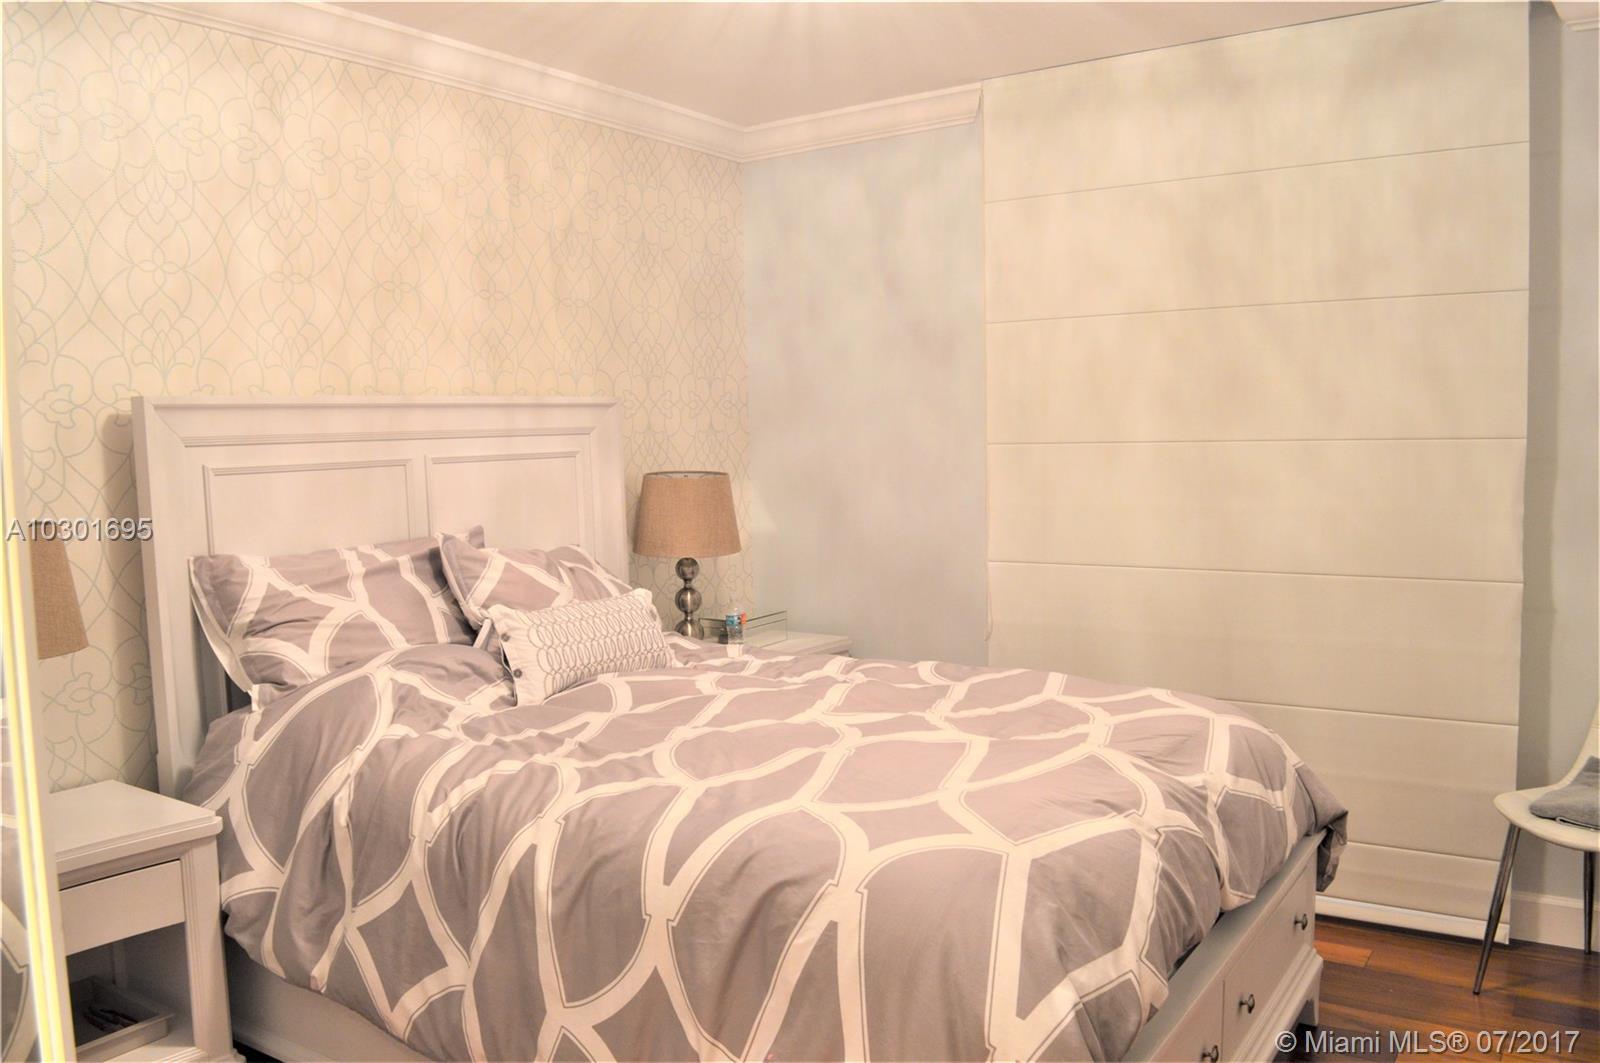 701 Brickell key blvd-1203 miami--fl-33131-a10301695-Pic15